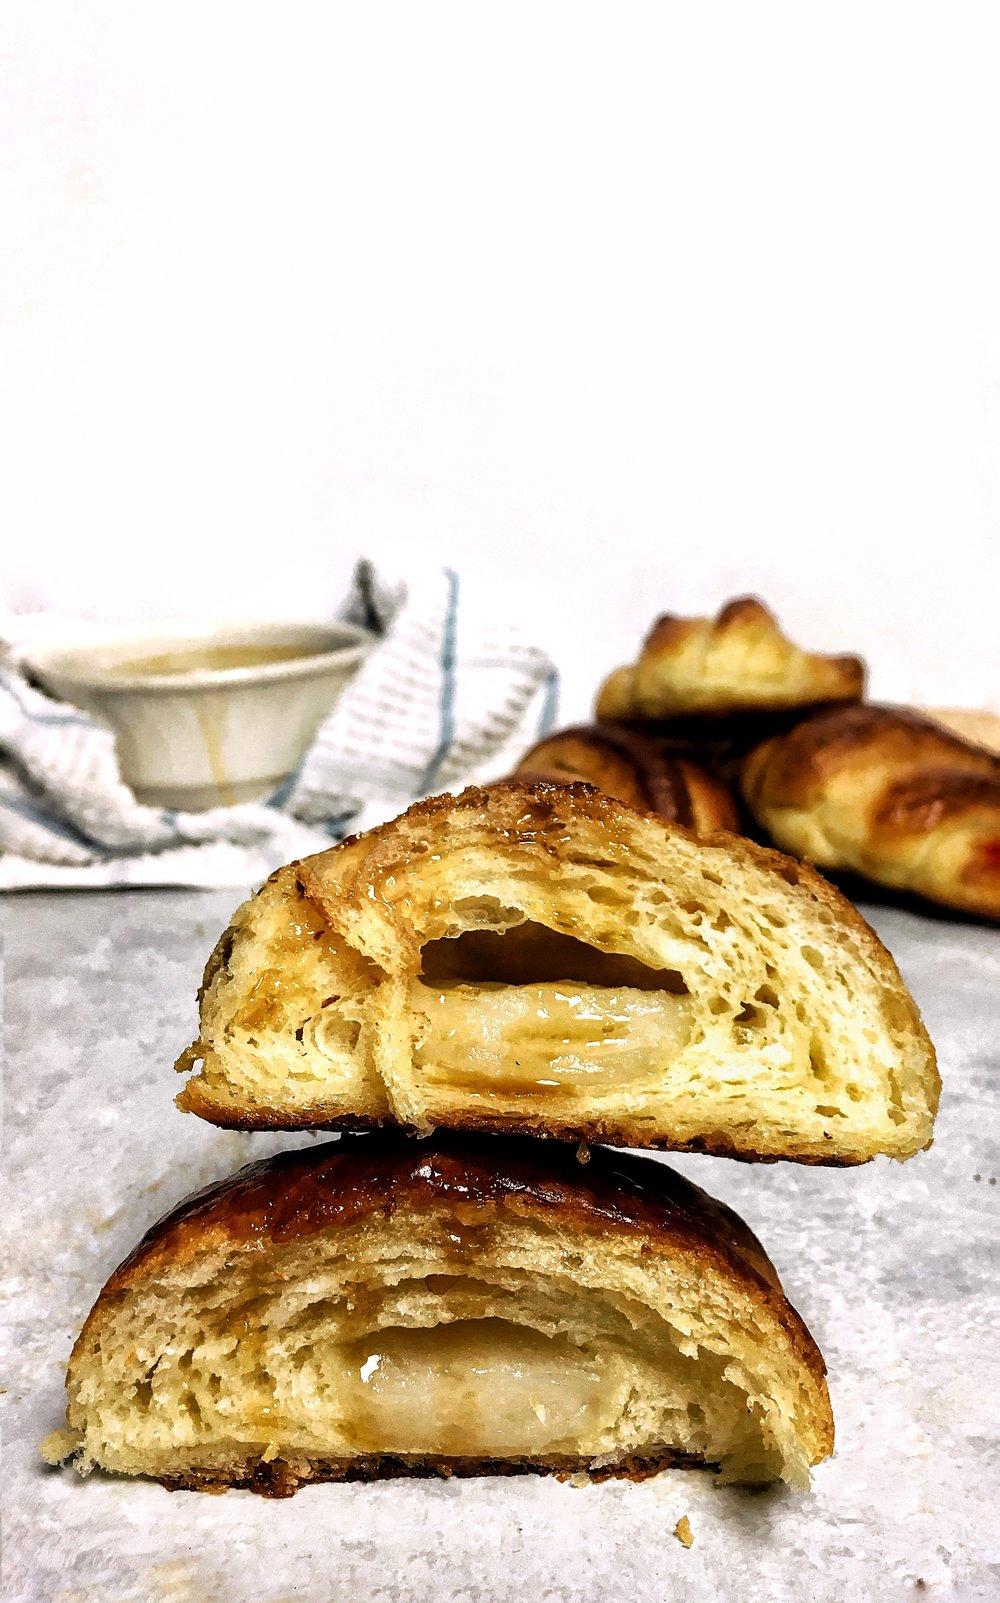 Mitarashi Mochi Croissant - Brad & Butter - February 26, 2019